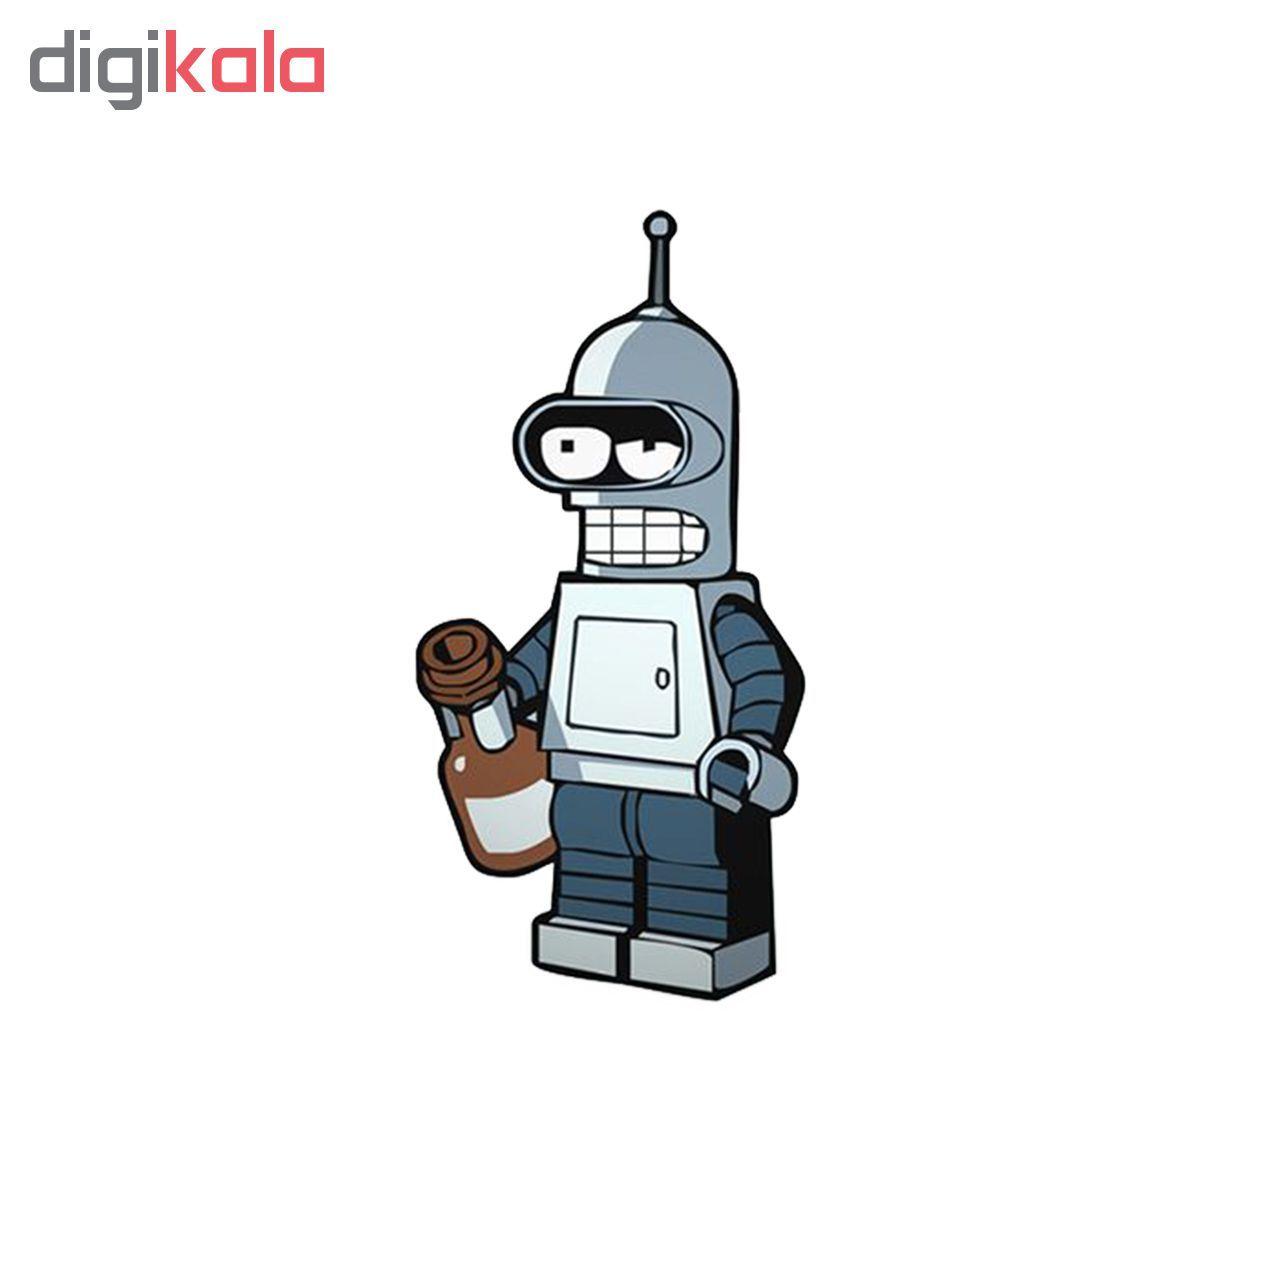 استیکر لپ تاپ طرح ربات کد 447 main 1 1